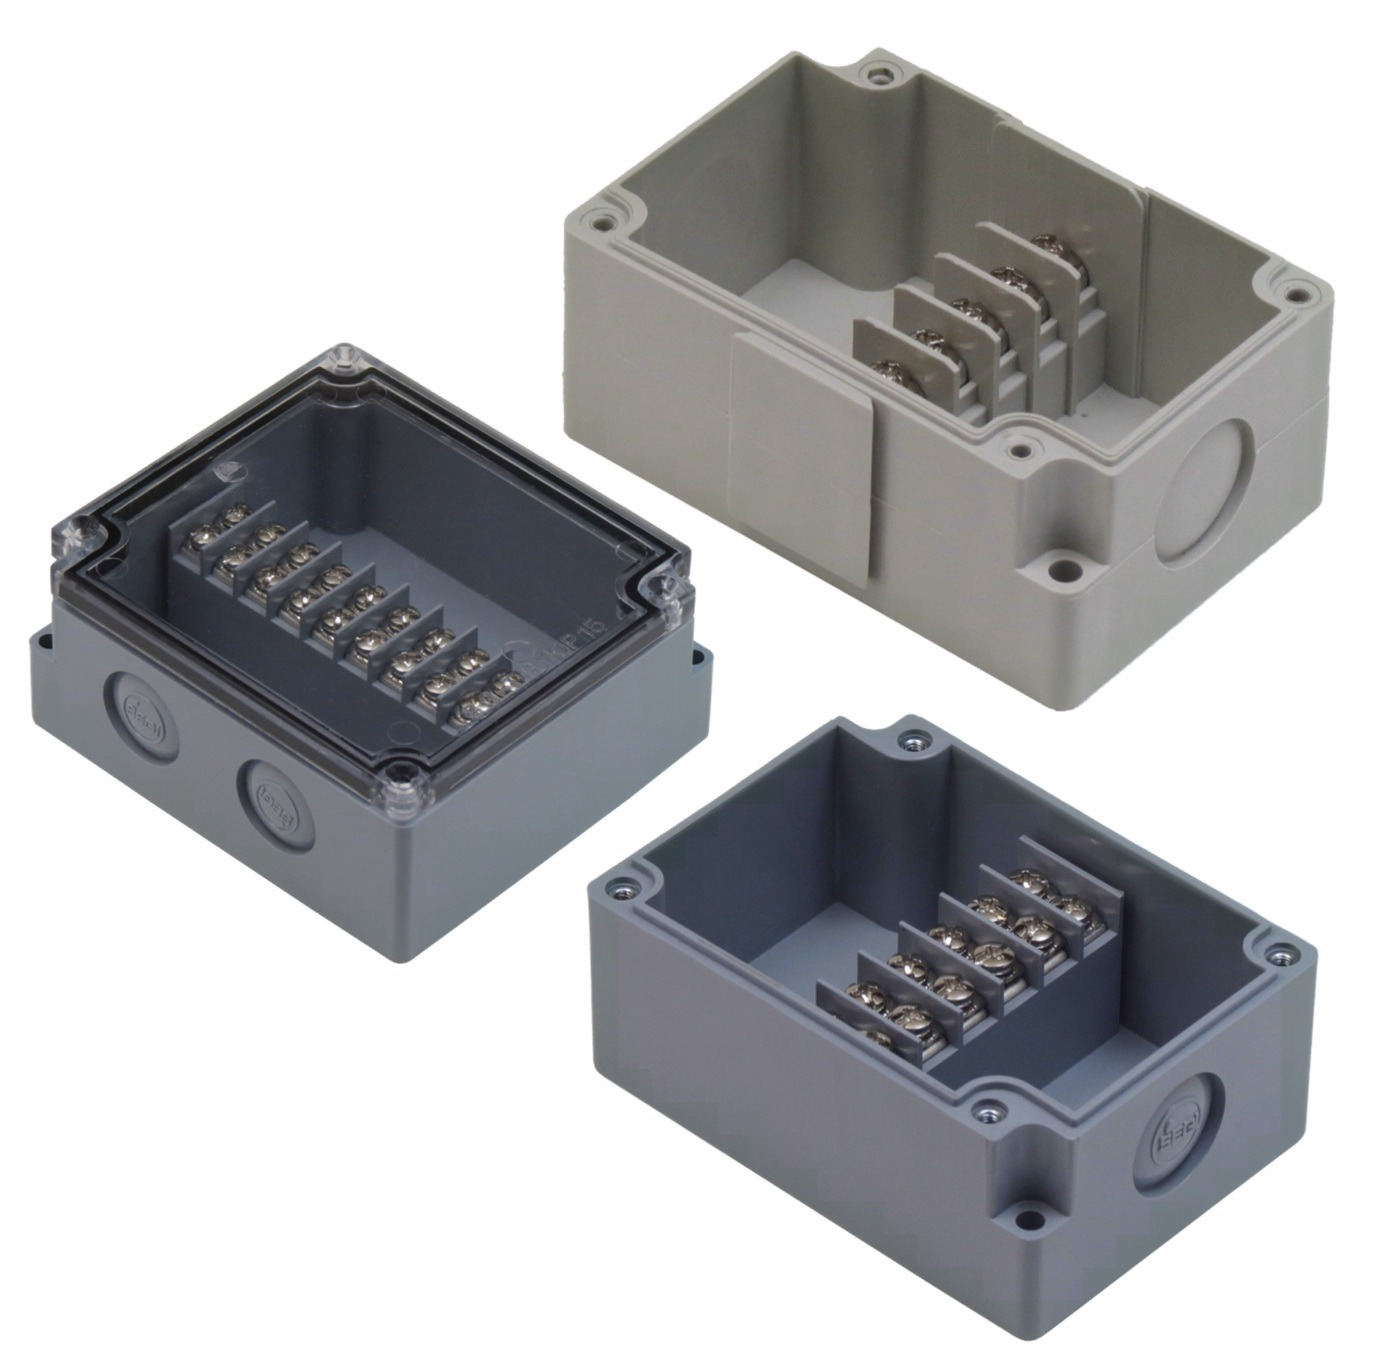 wiring terminal box wiring diagram services u2022 rh openairpublishing com Wiring Terminal Strips Electrical Terminal Connections